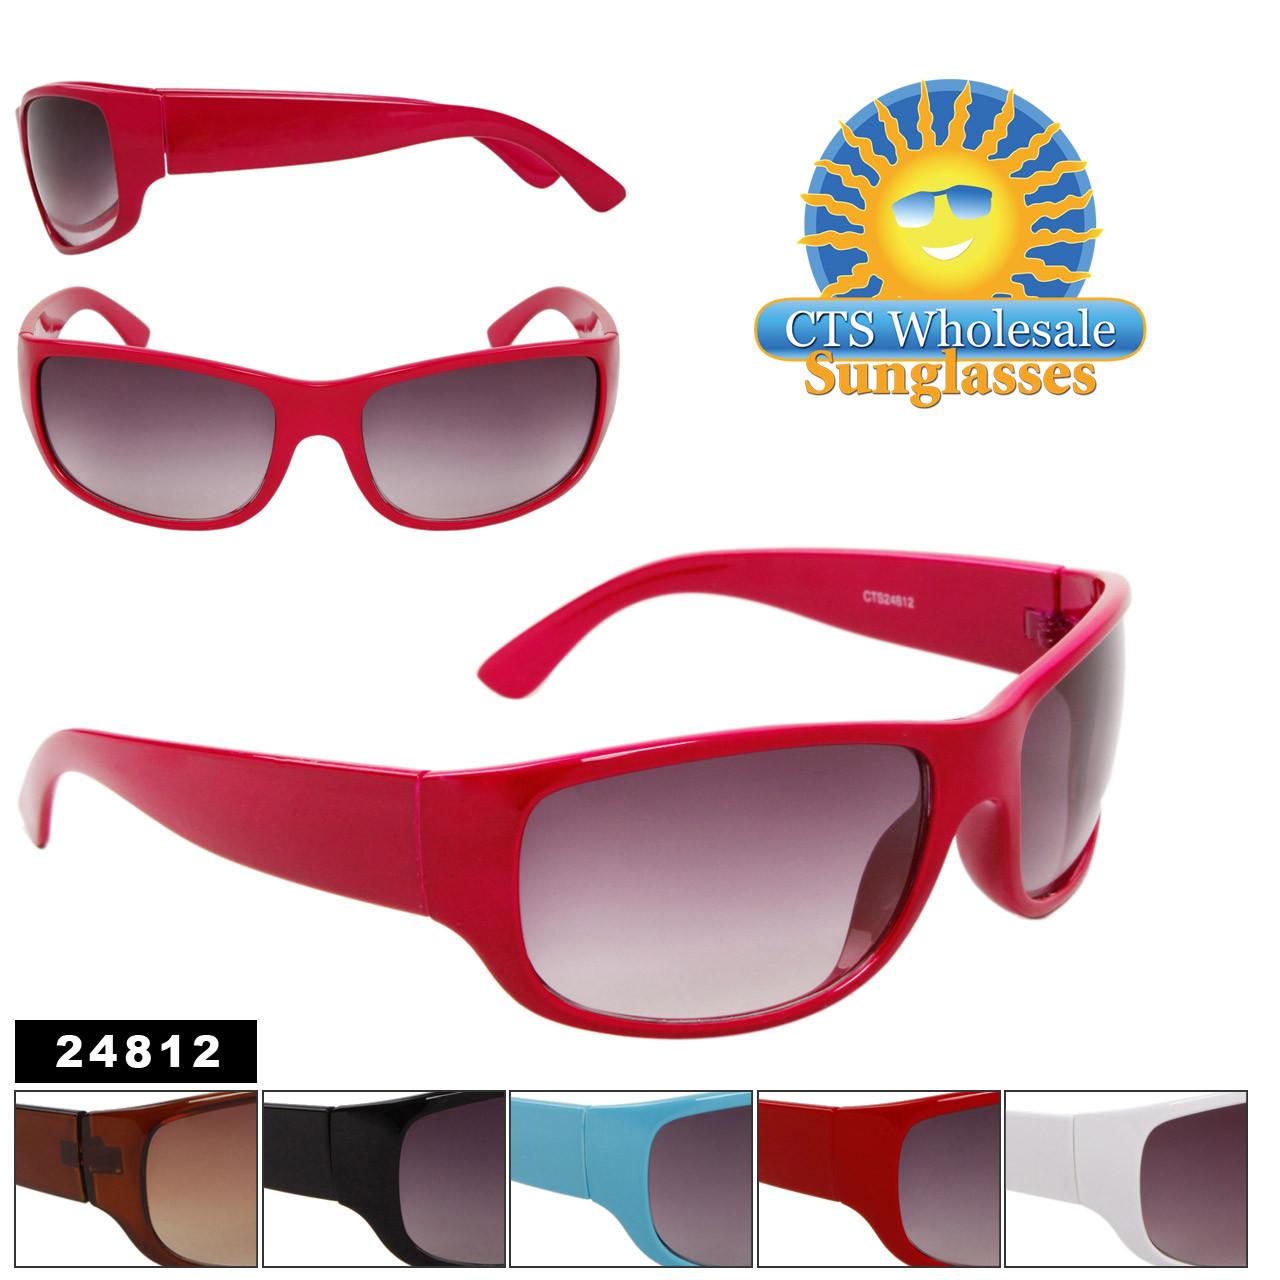 24812 Wholesale Sunglasses